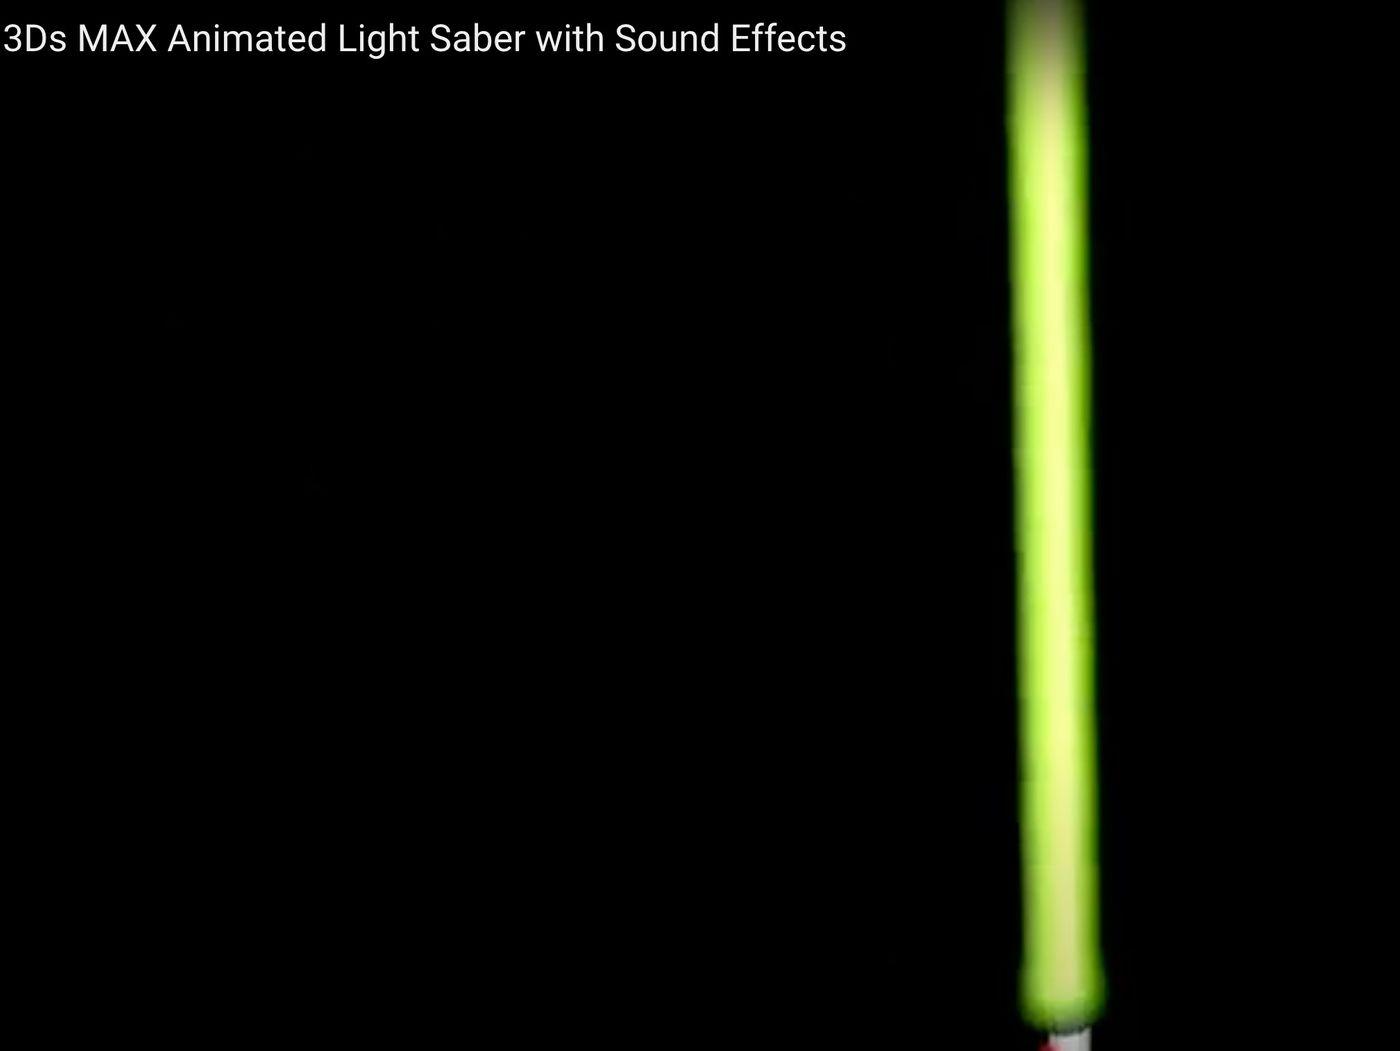 3D Animated Lightsaber